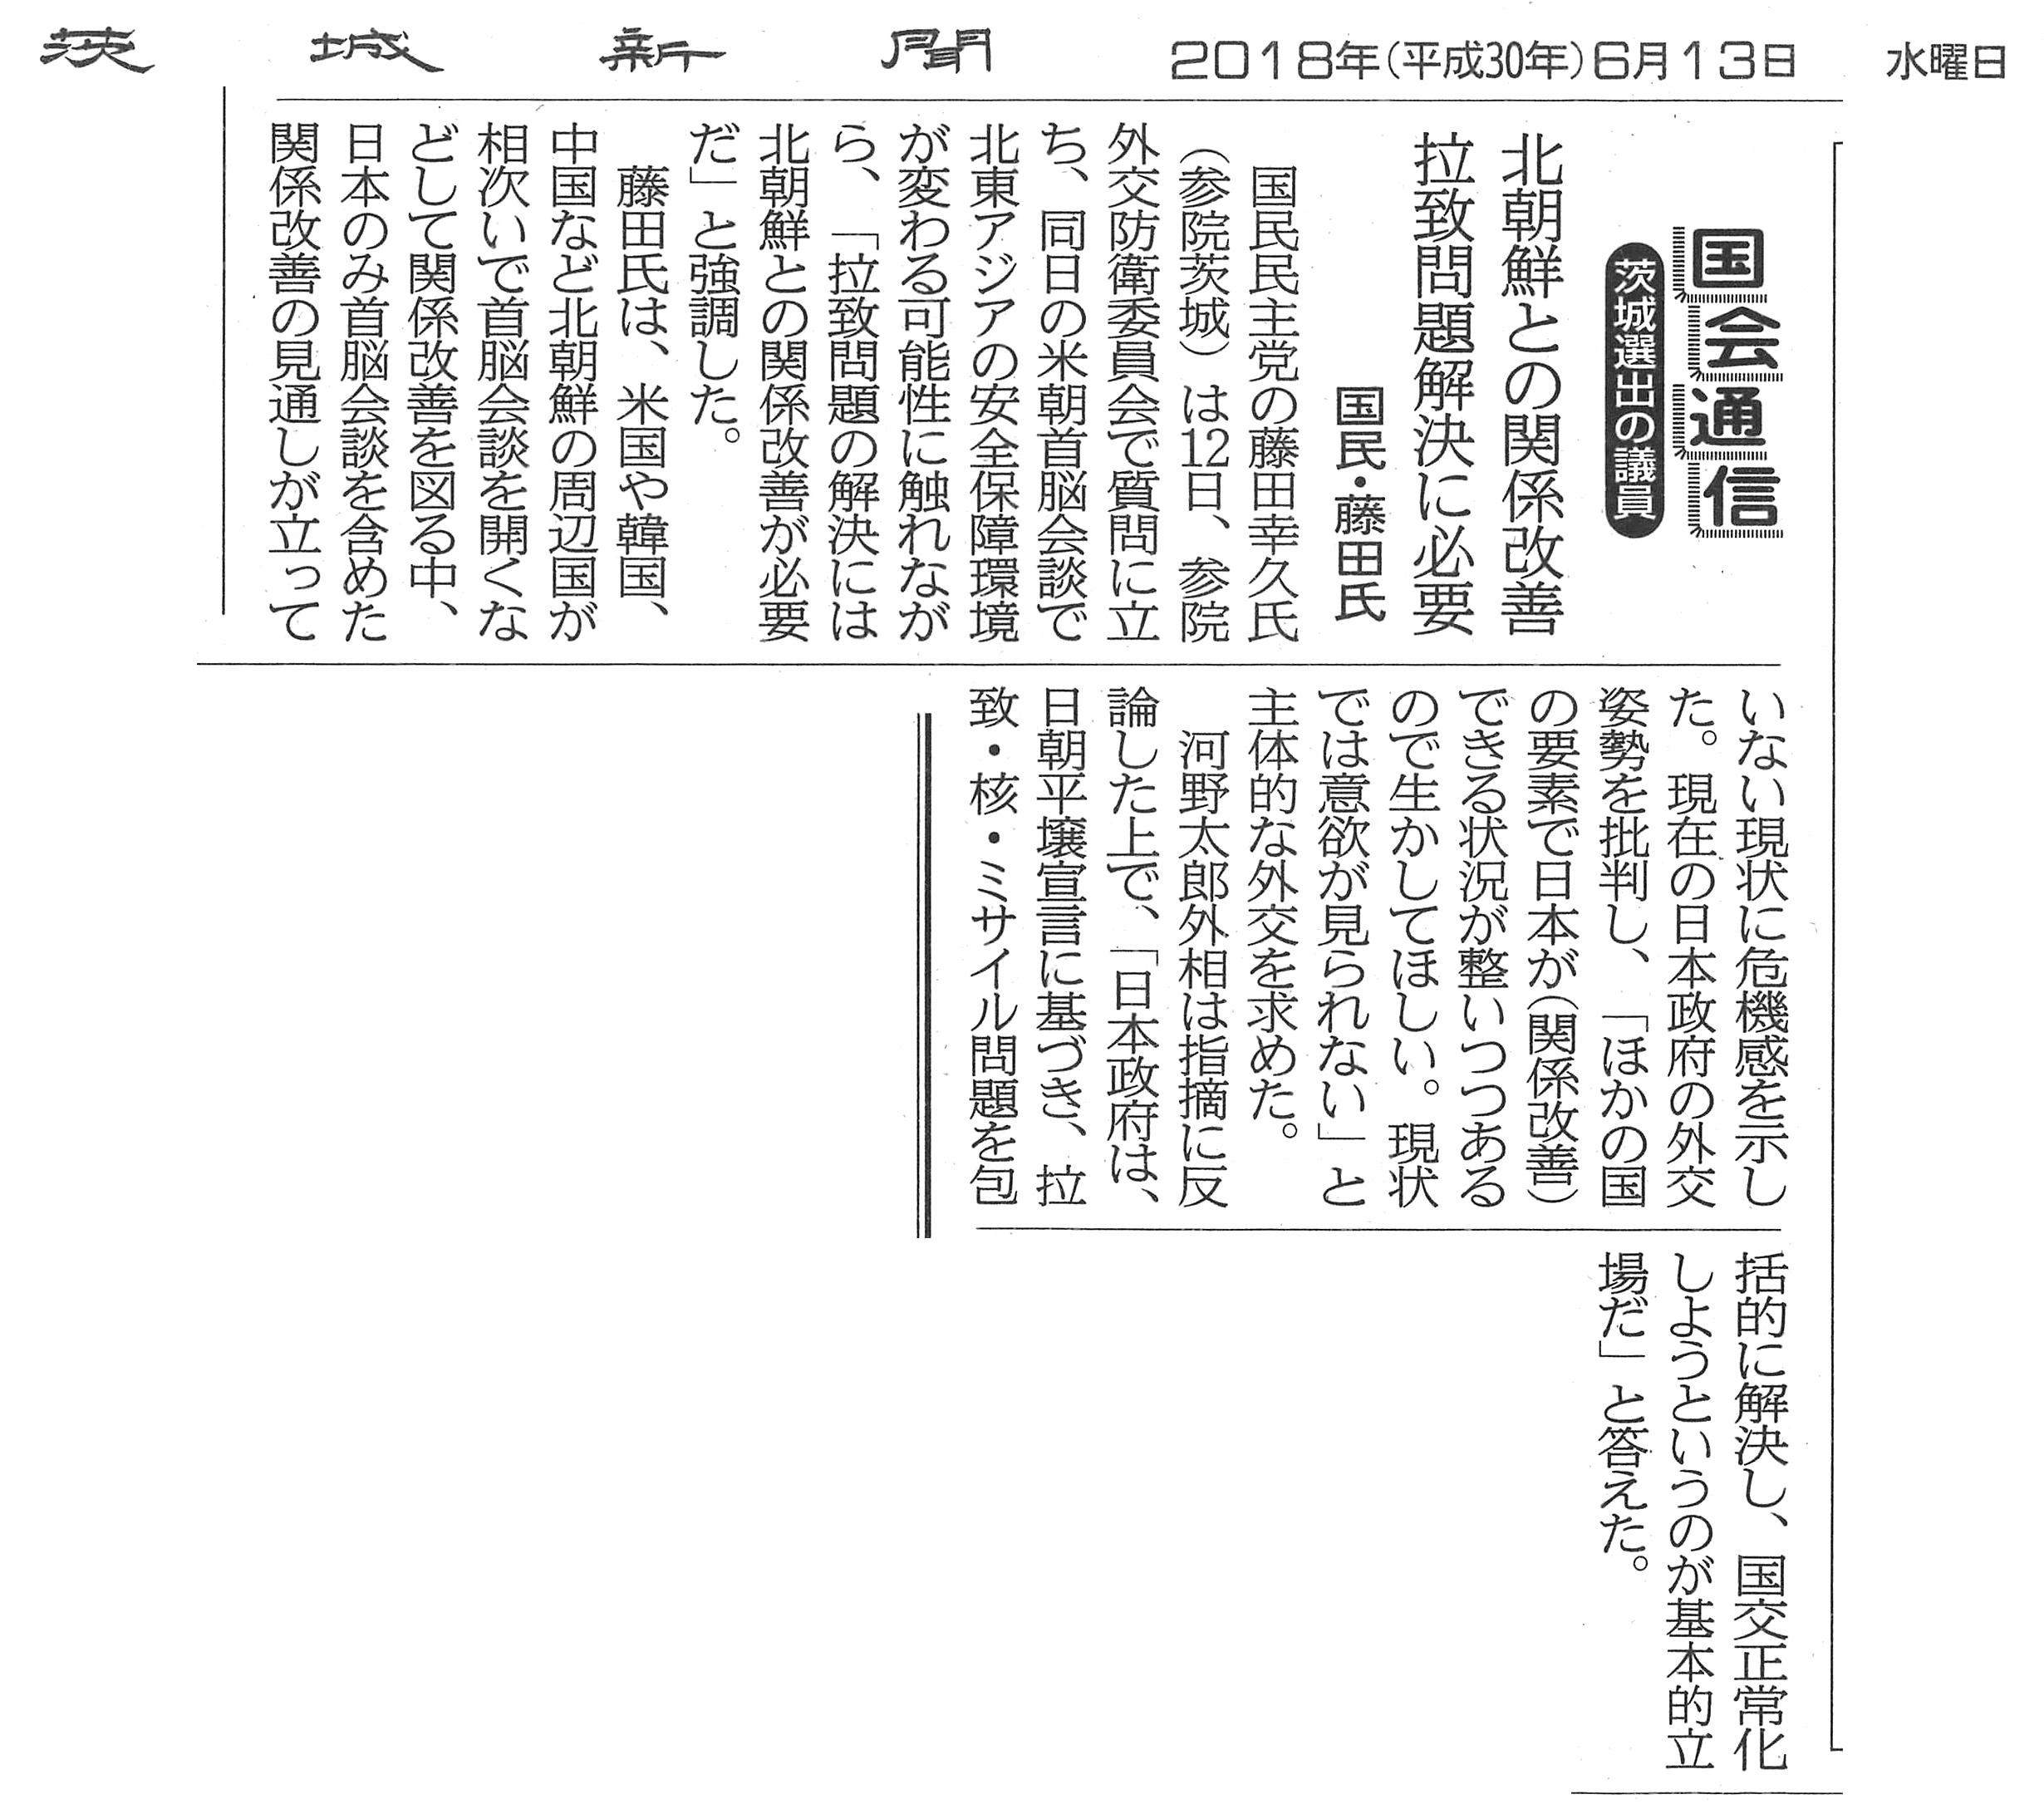 【茨城新聞】国会通信 北朝鮮との関係改善 拉致問題解決に必要